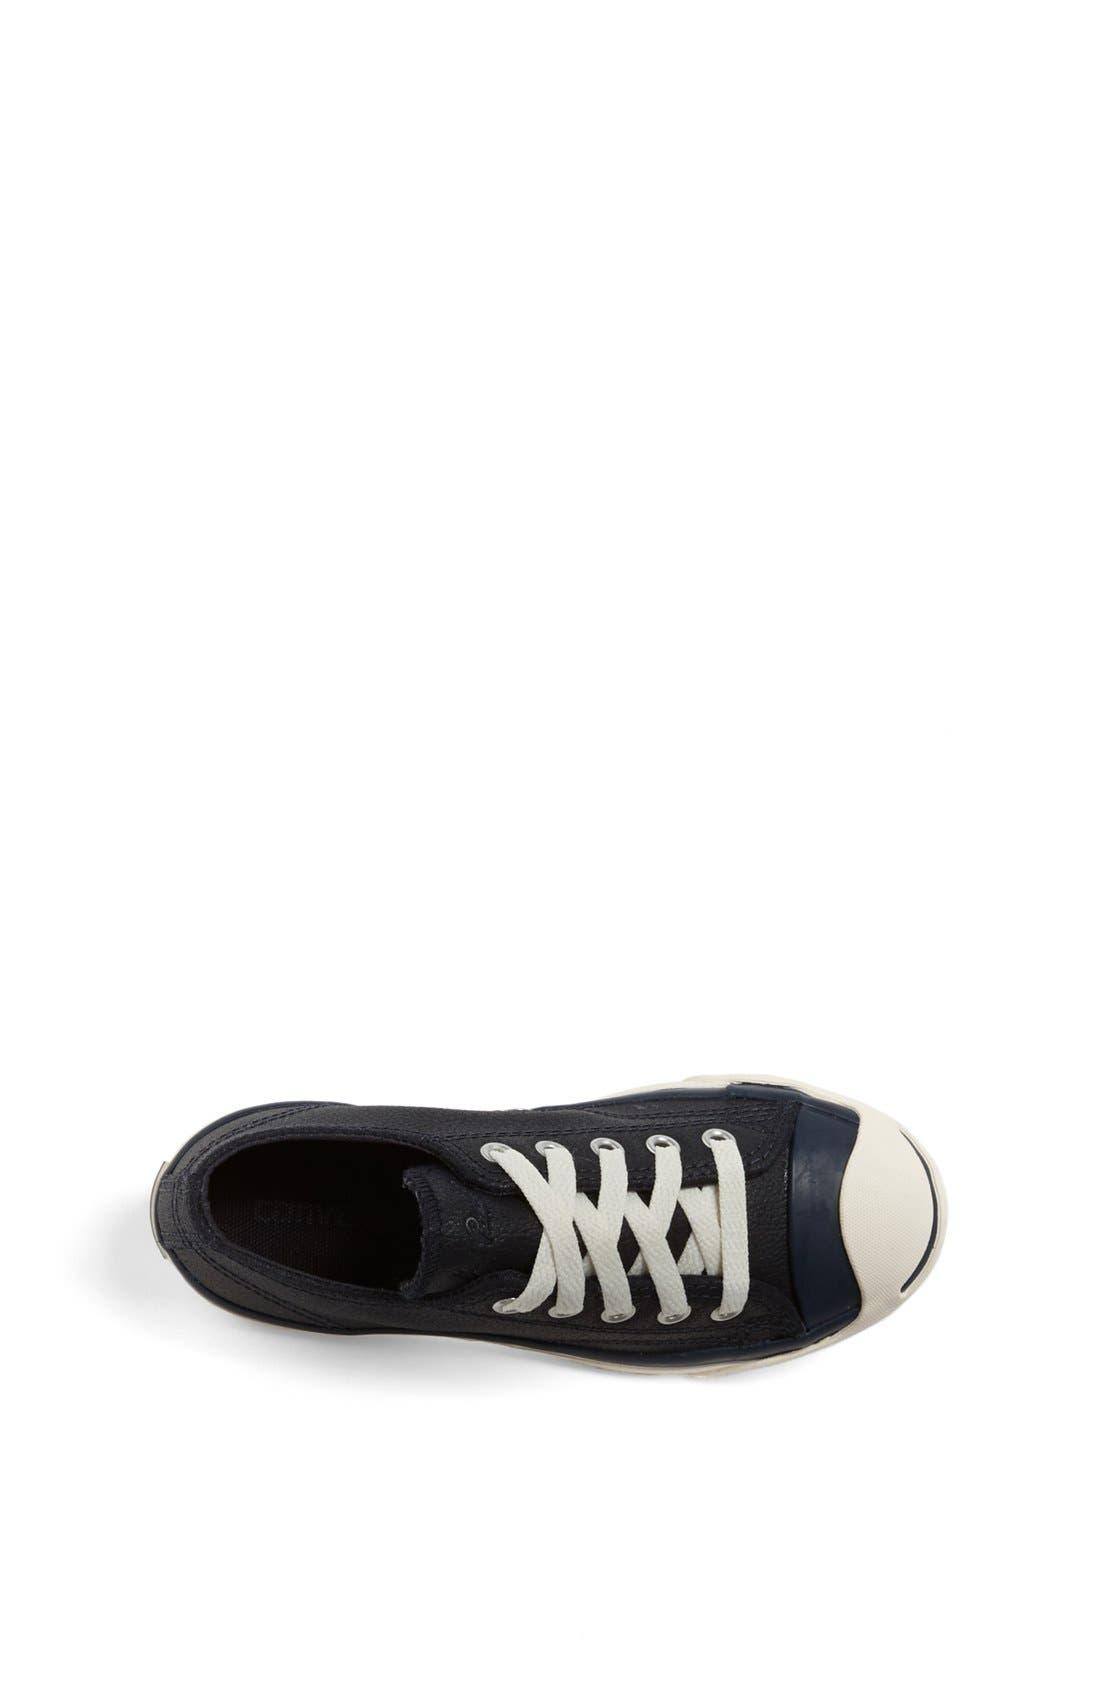 Alternate Image 3  - Converse 'Jack Purcell' Sneaker (Toddler, Little Kid & Big Kid)